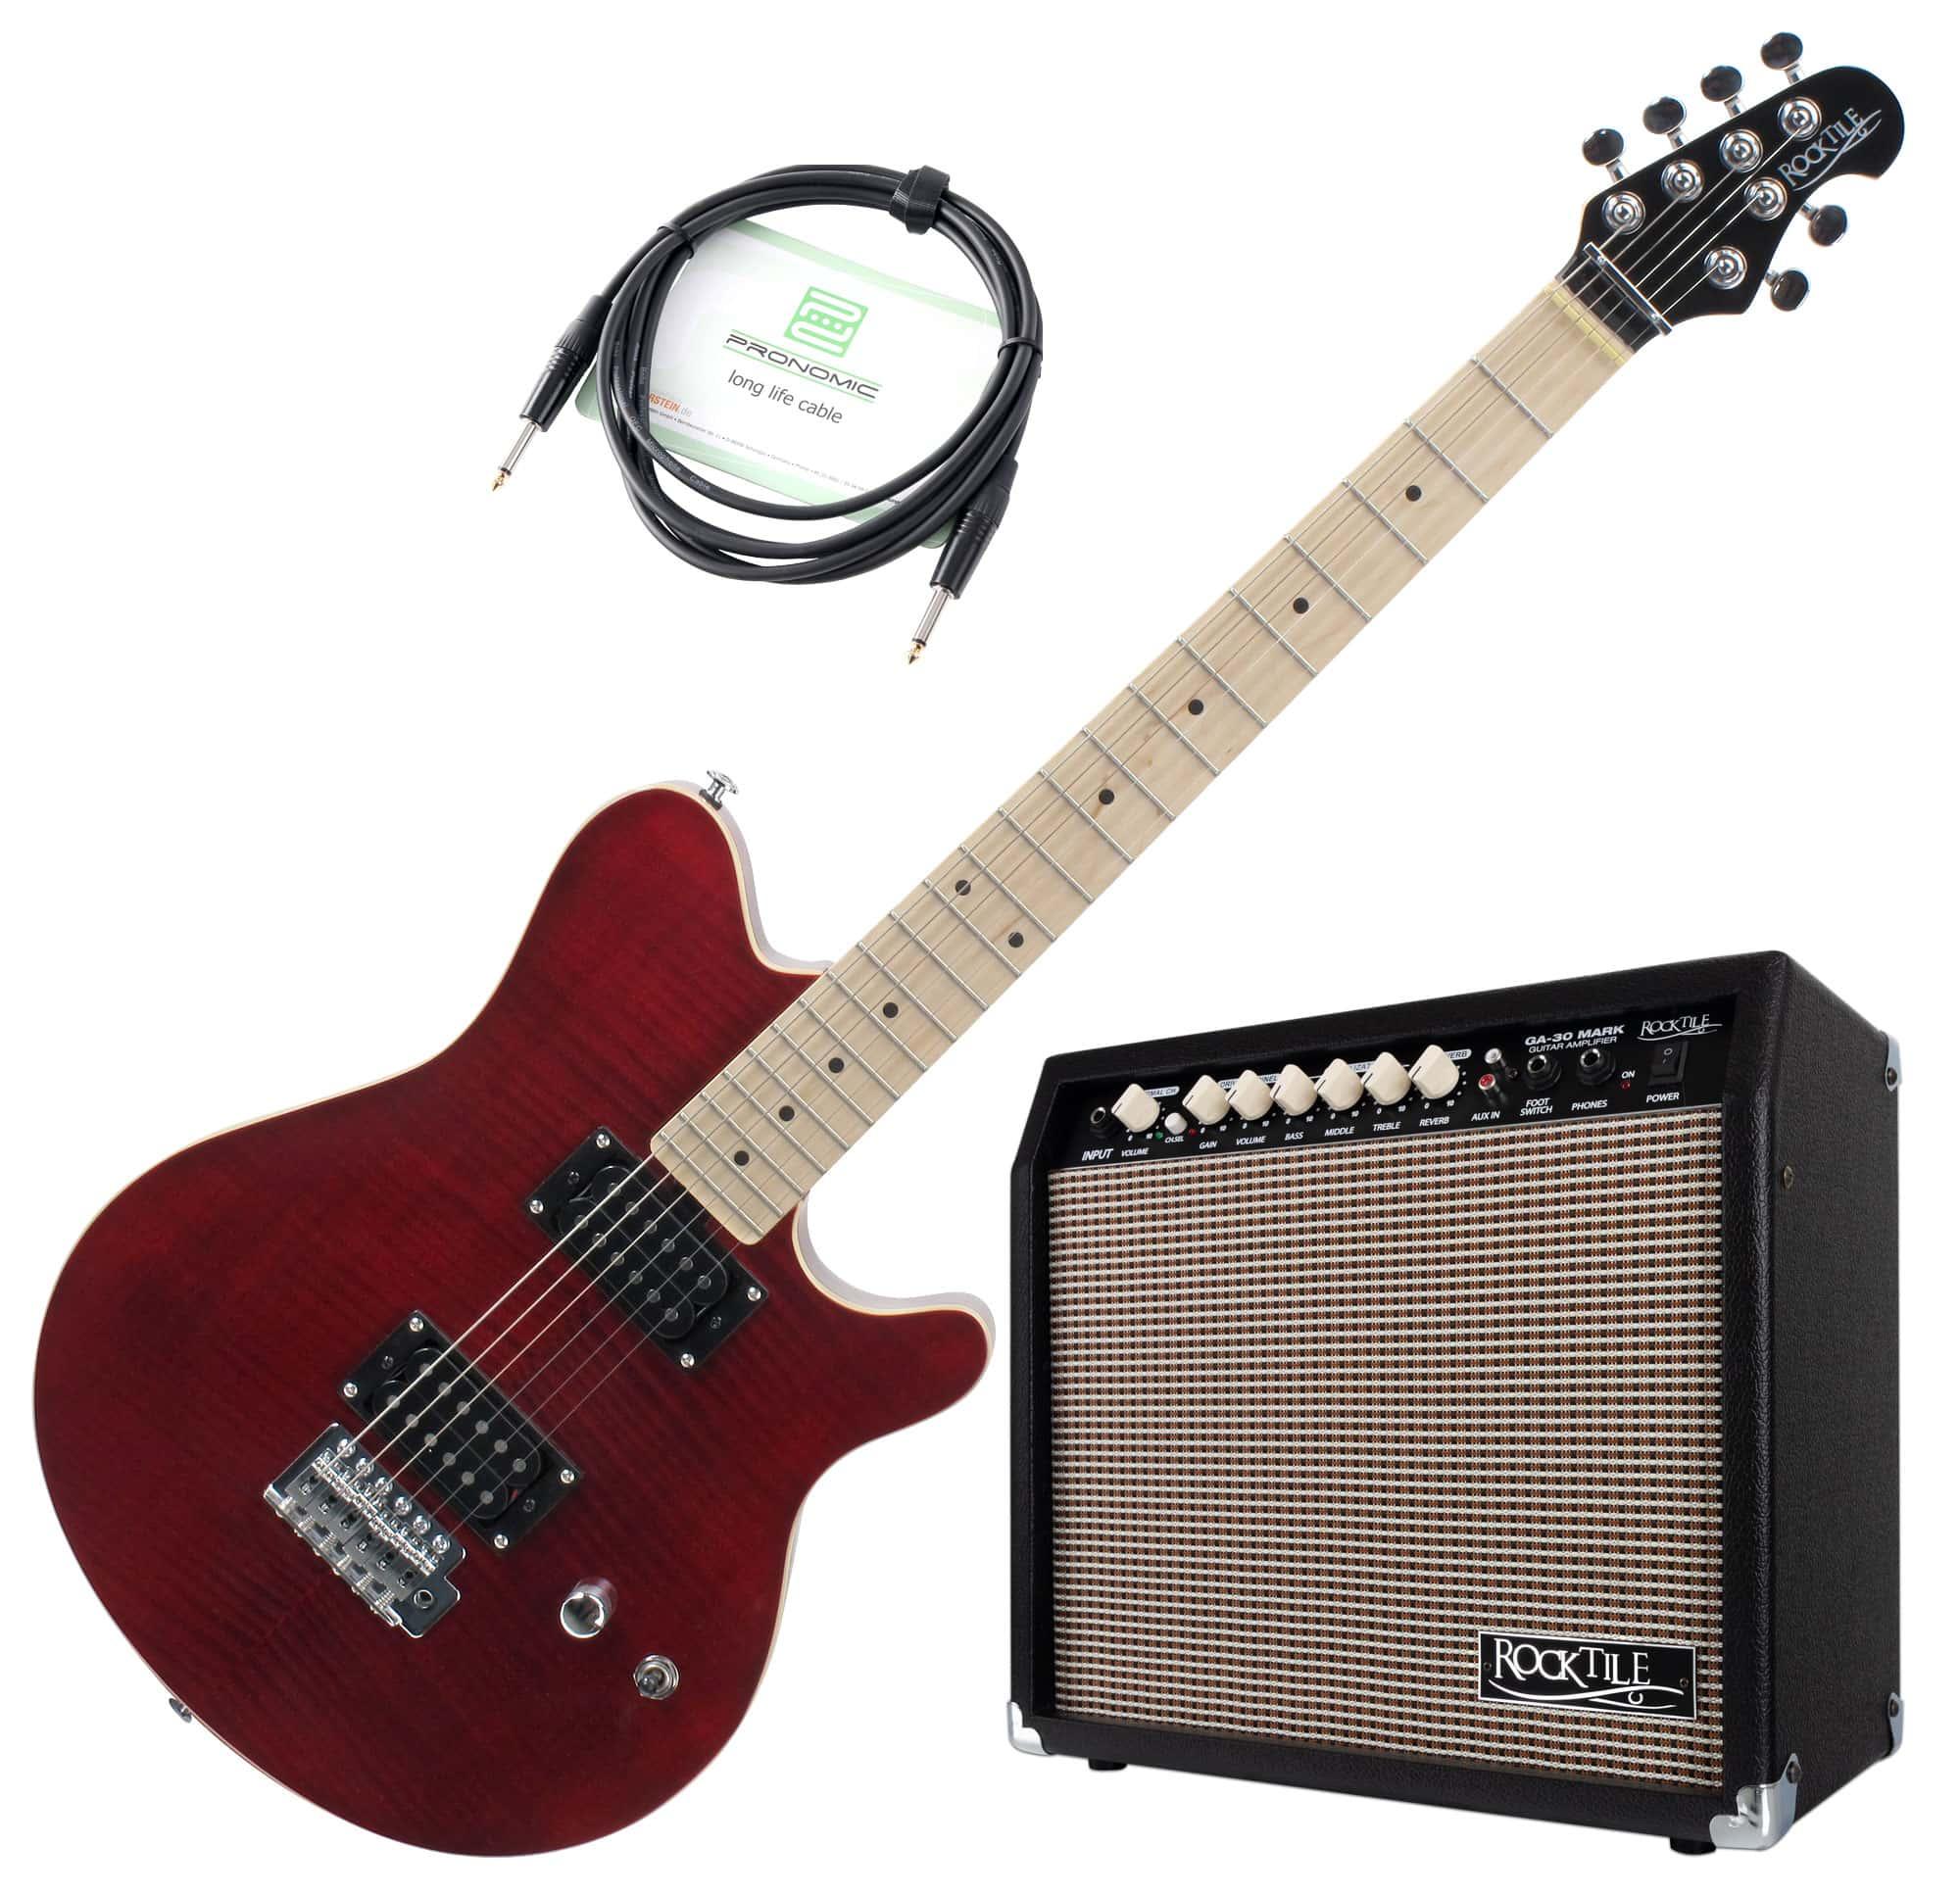 Egitarren - Rocktile Pro MM150 TR E Gitarre Verstärker Set - Onlineshop Musikhaus Kirstein